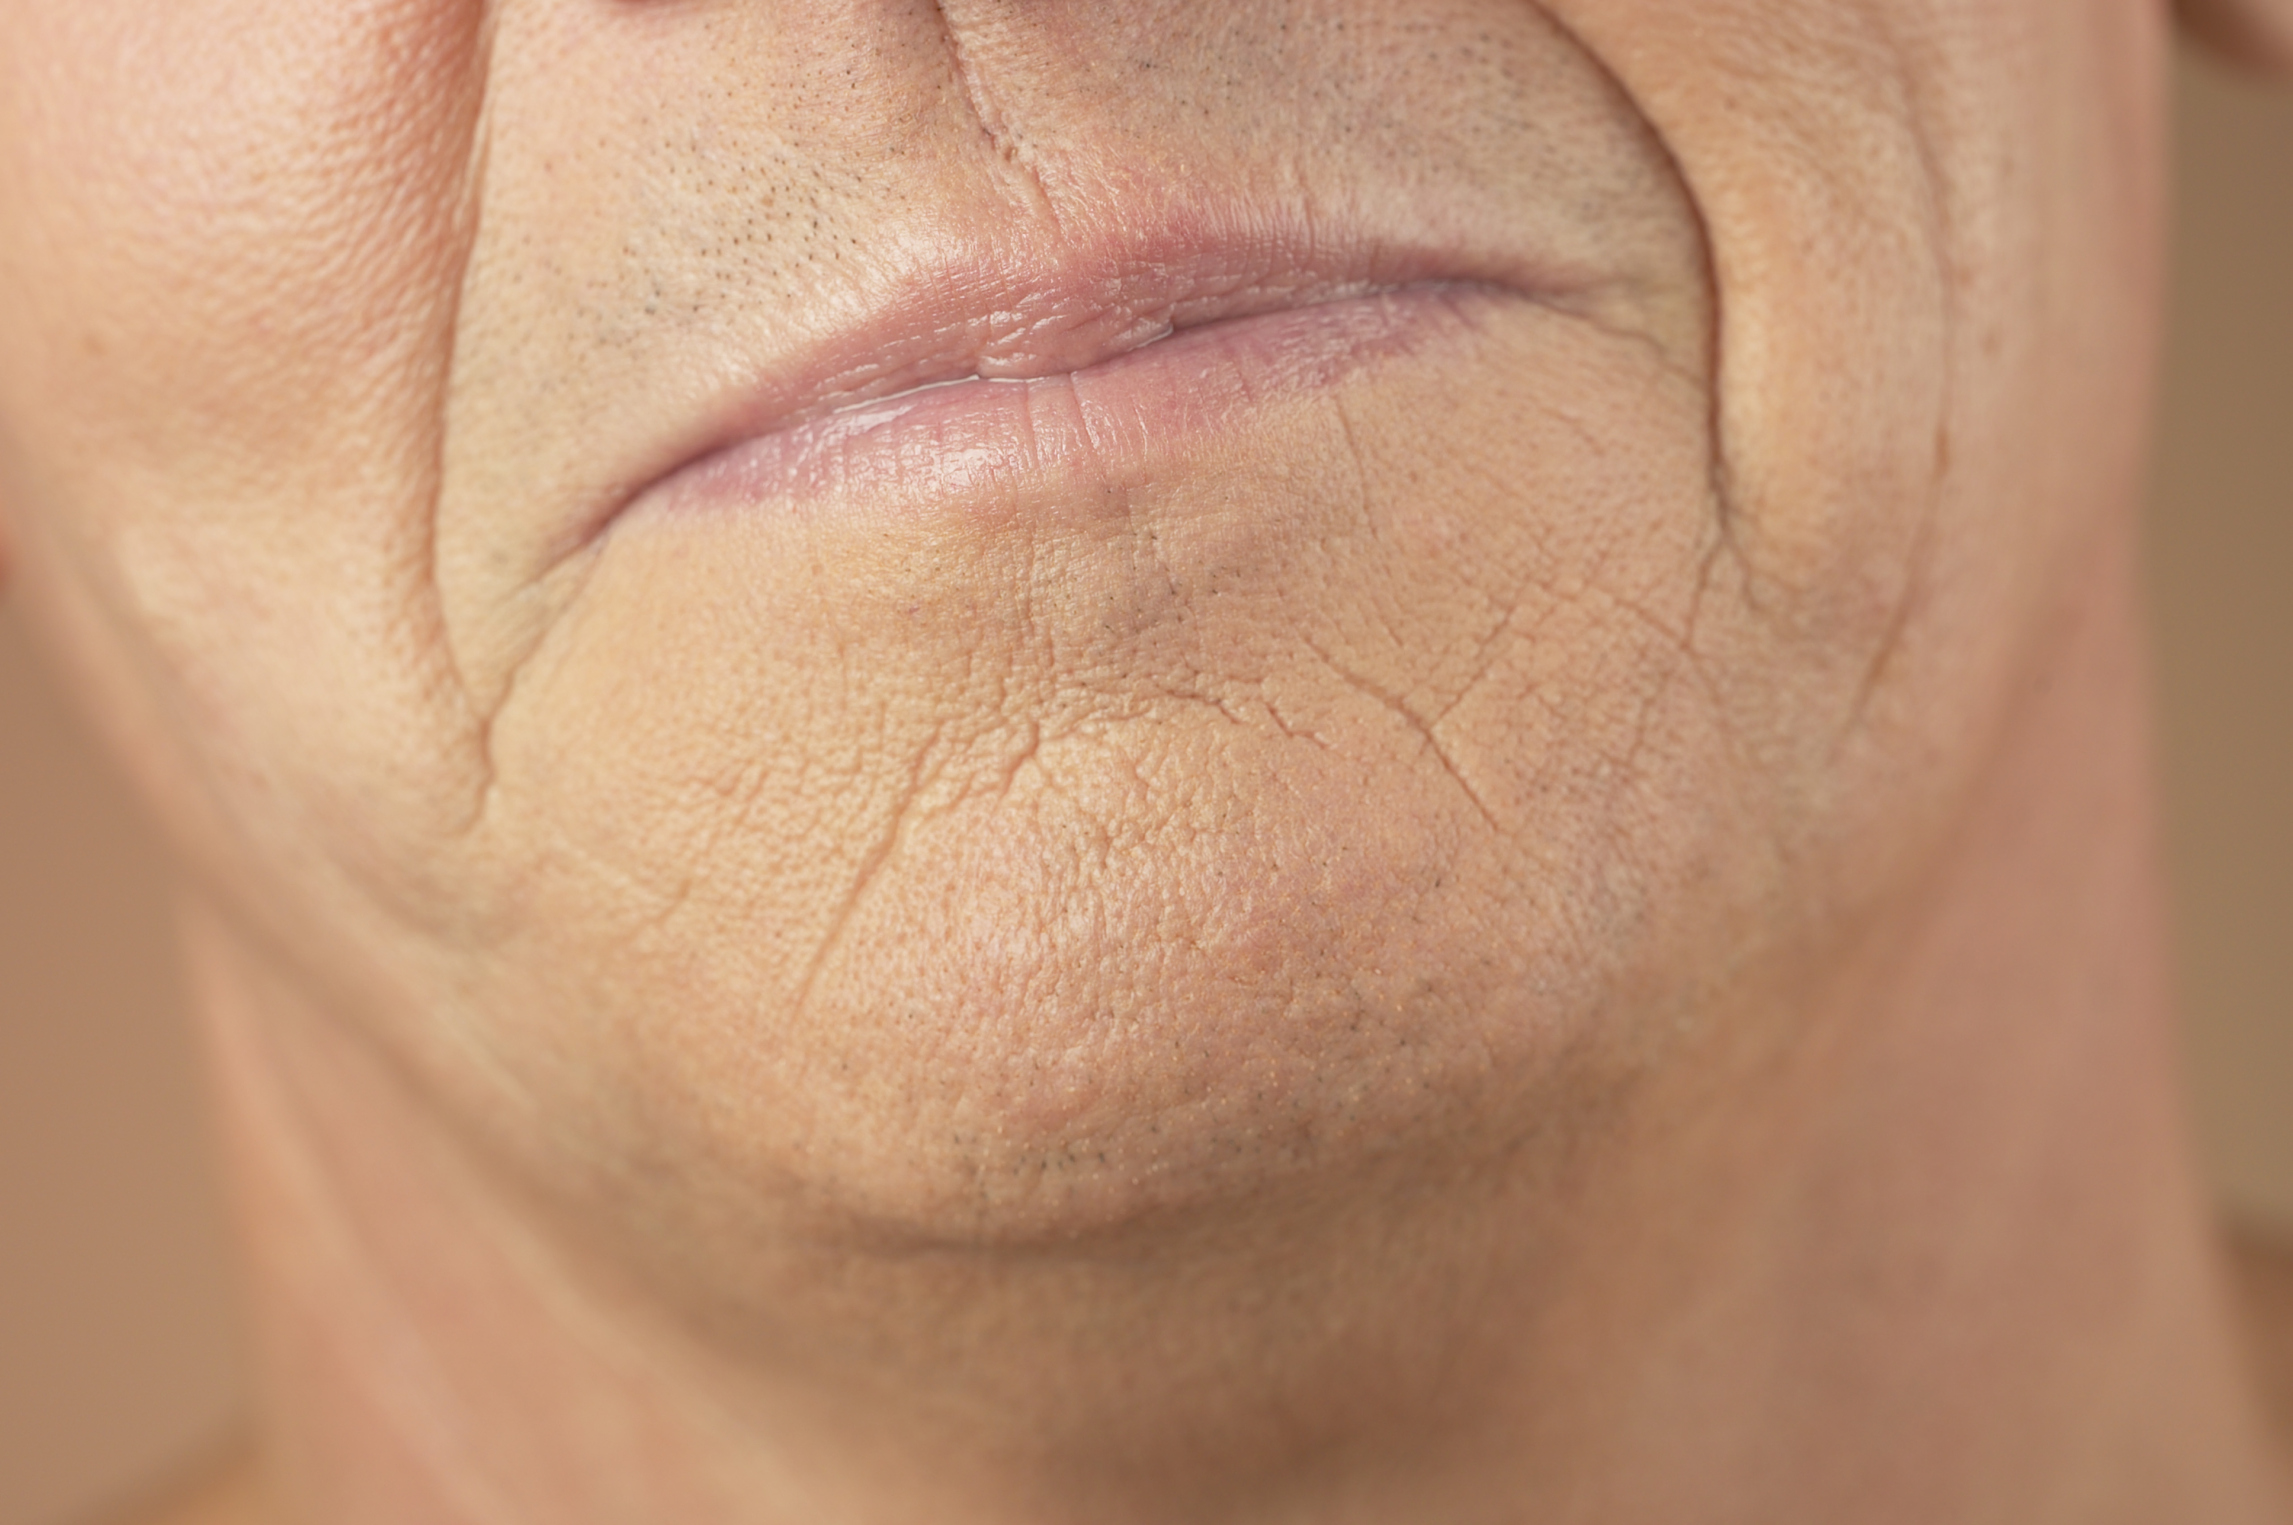 How to Repair Skin Damage From Smoking